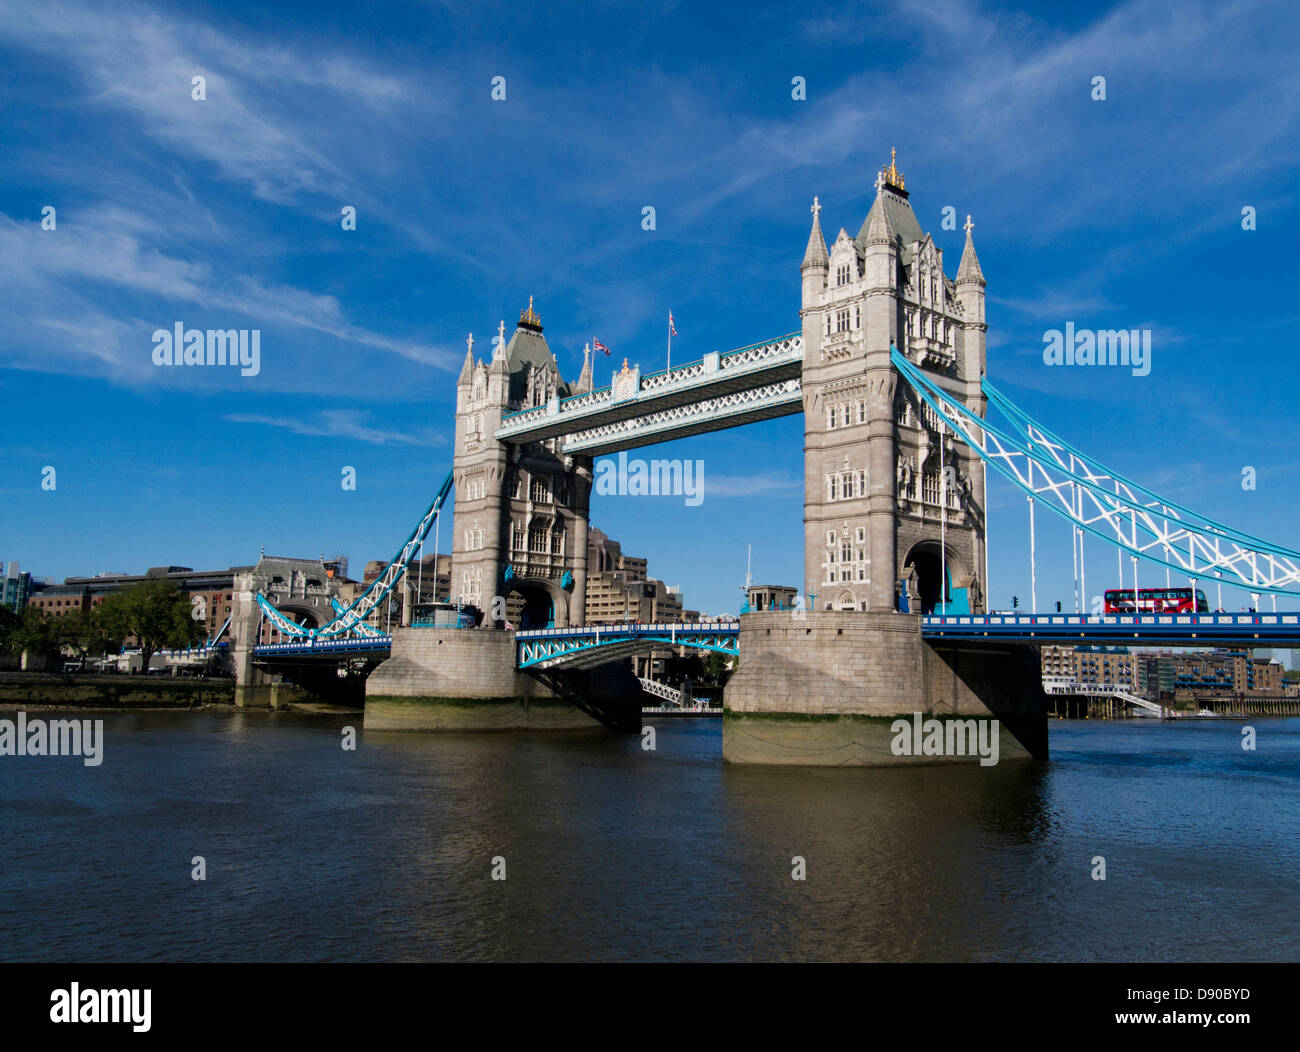 Tower Bridge over the River Thames, London, UK Stock Photo